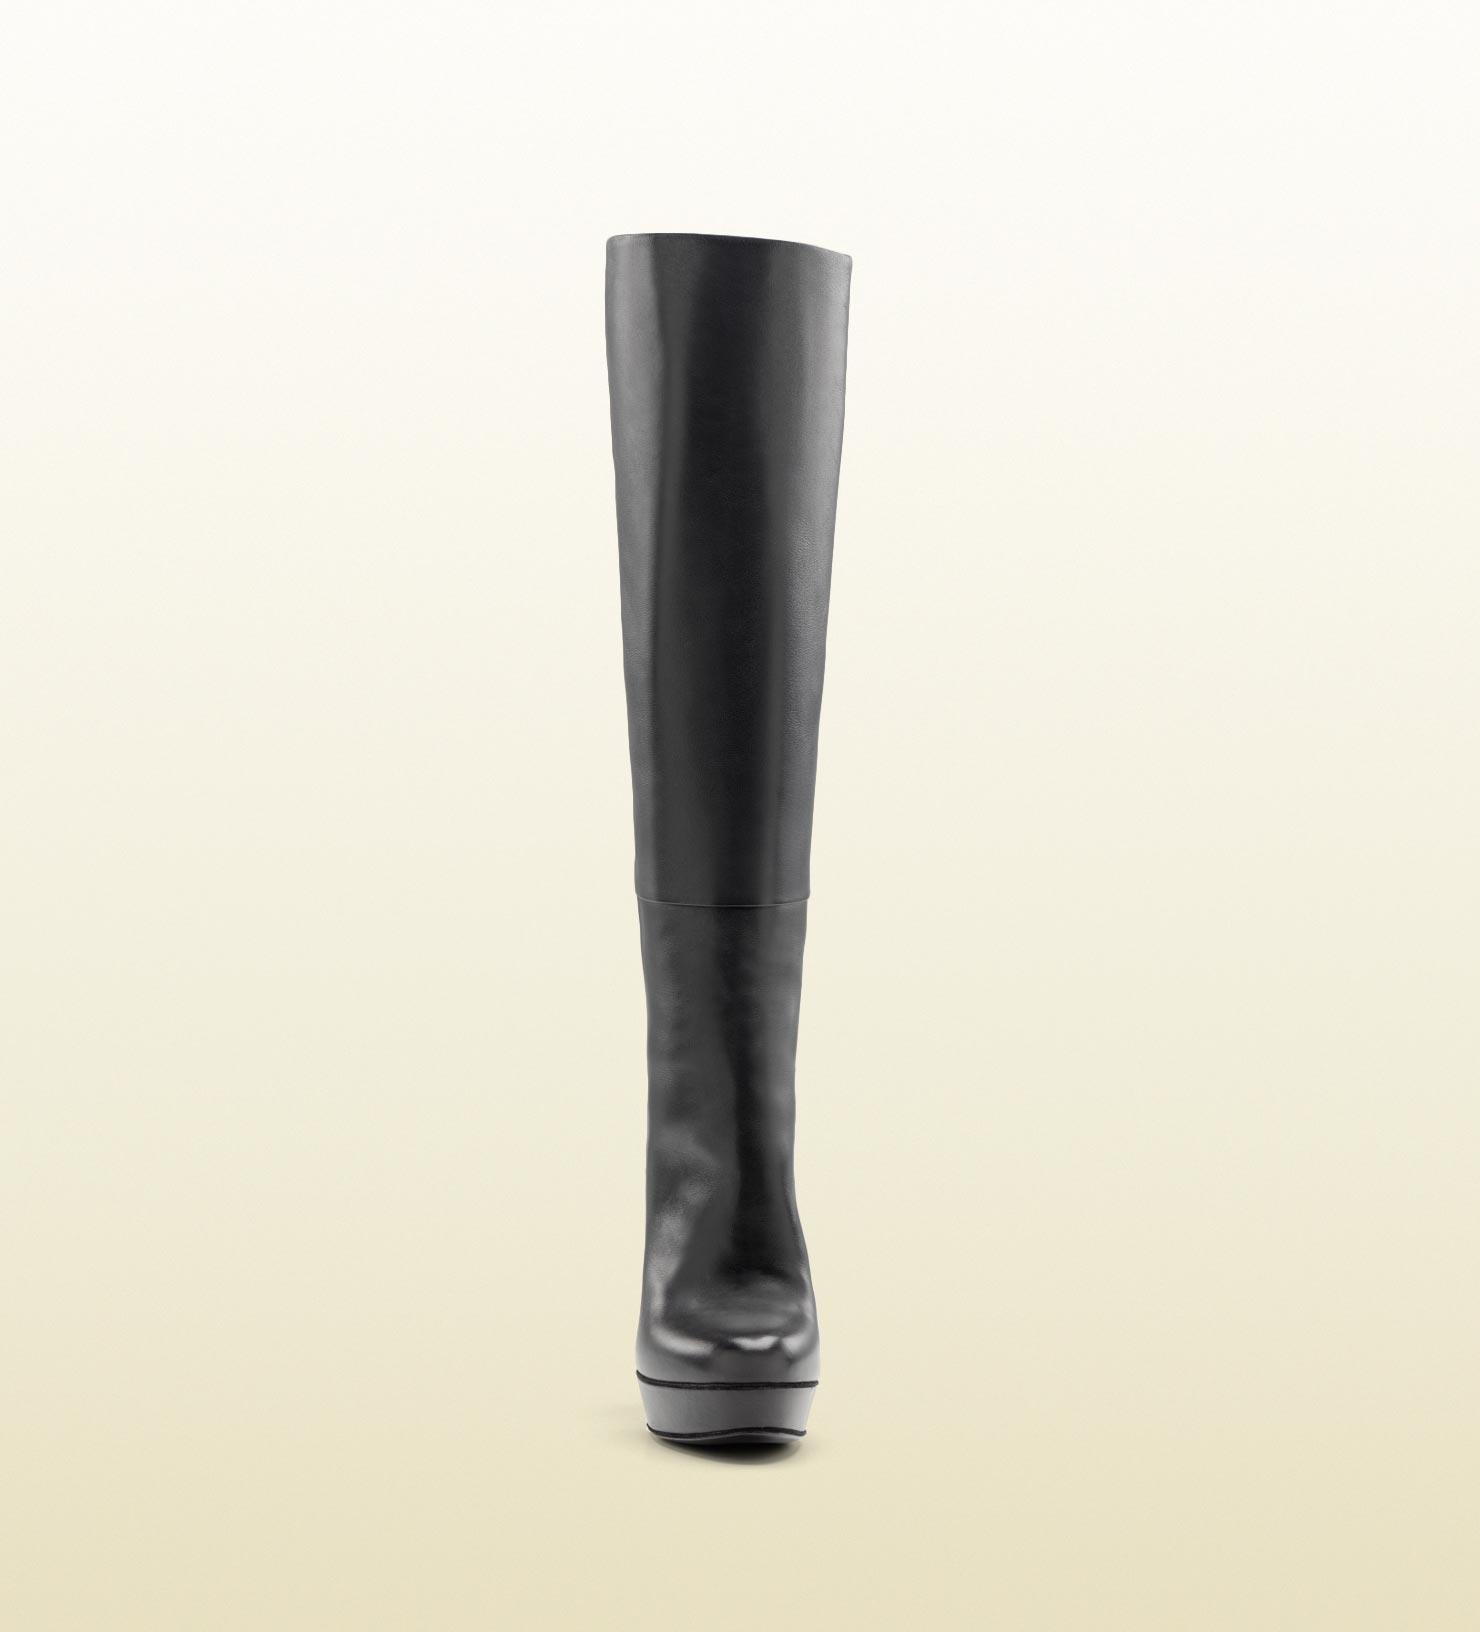 cf1d05553e6 Lyst - Gucci Alexa High Heel Platform Boot in Black